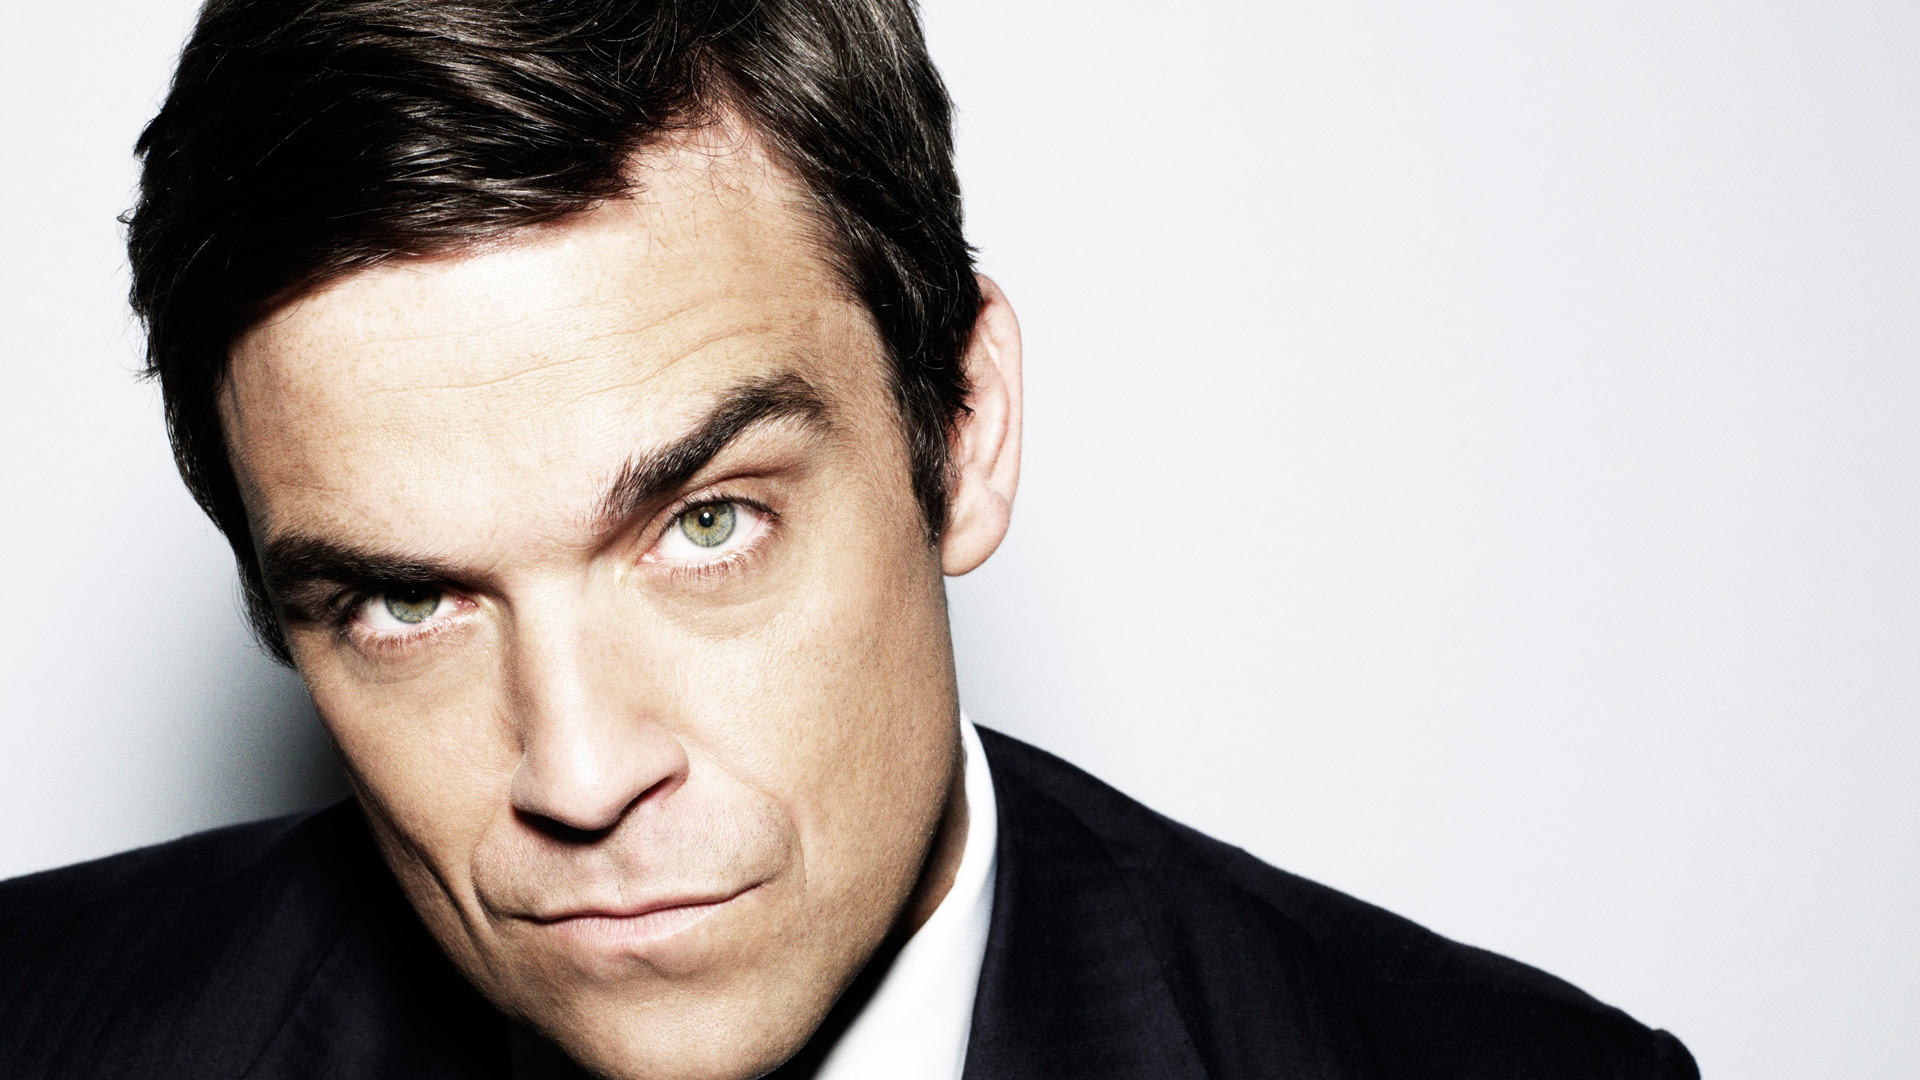 Robbie Williams Hd Wallpaper